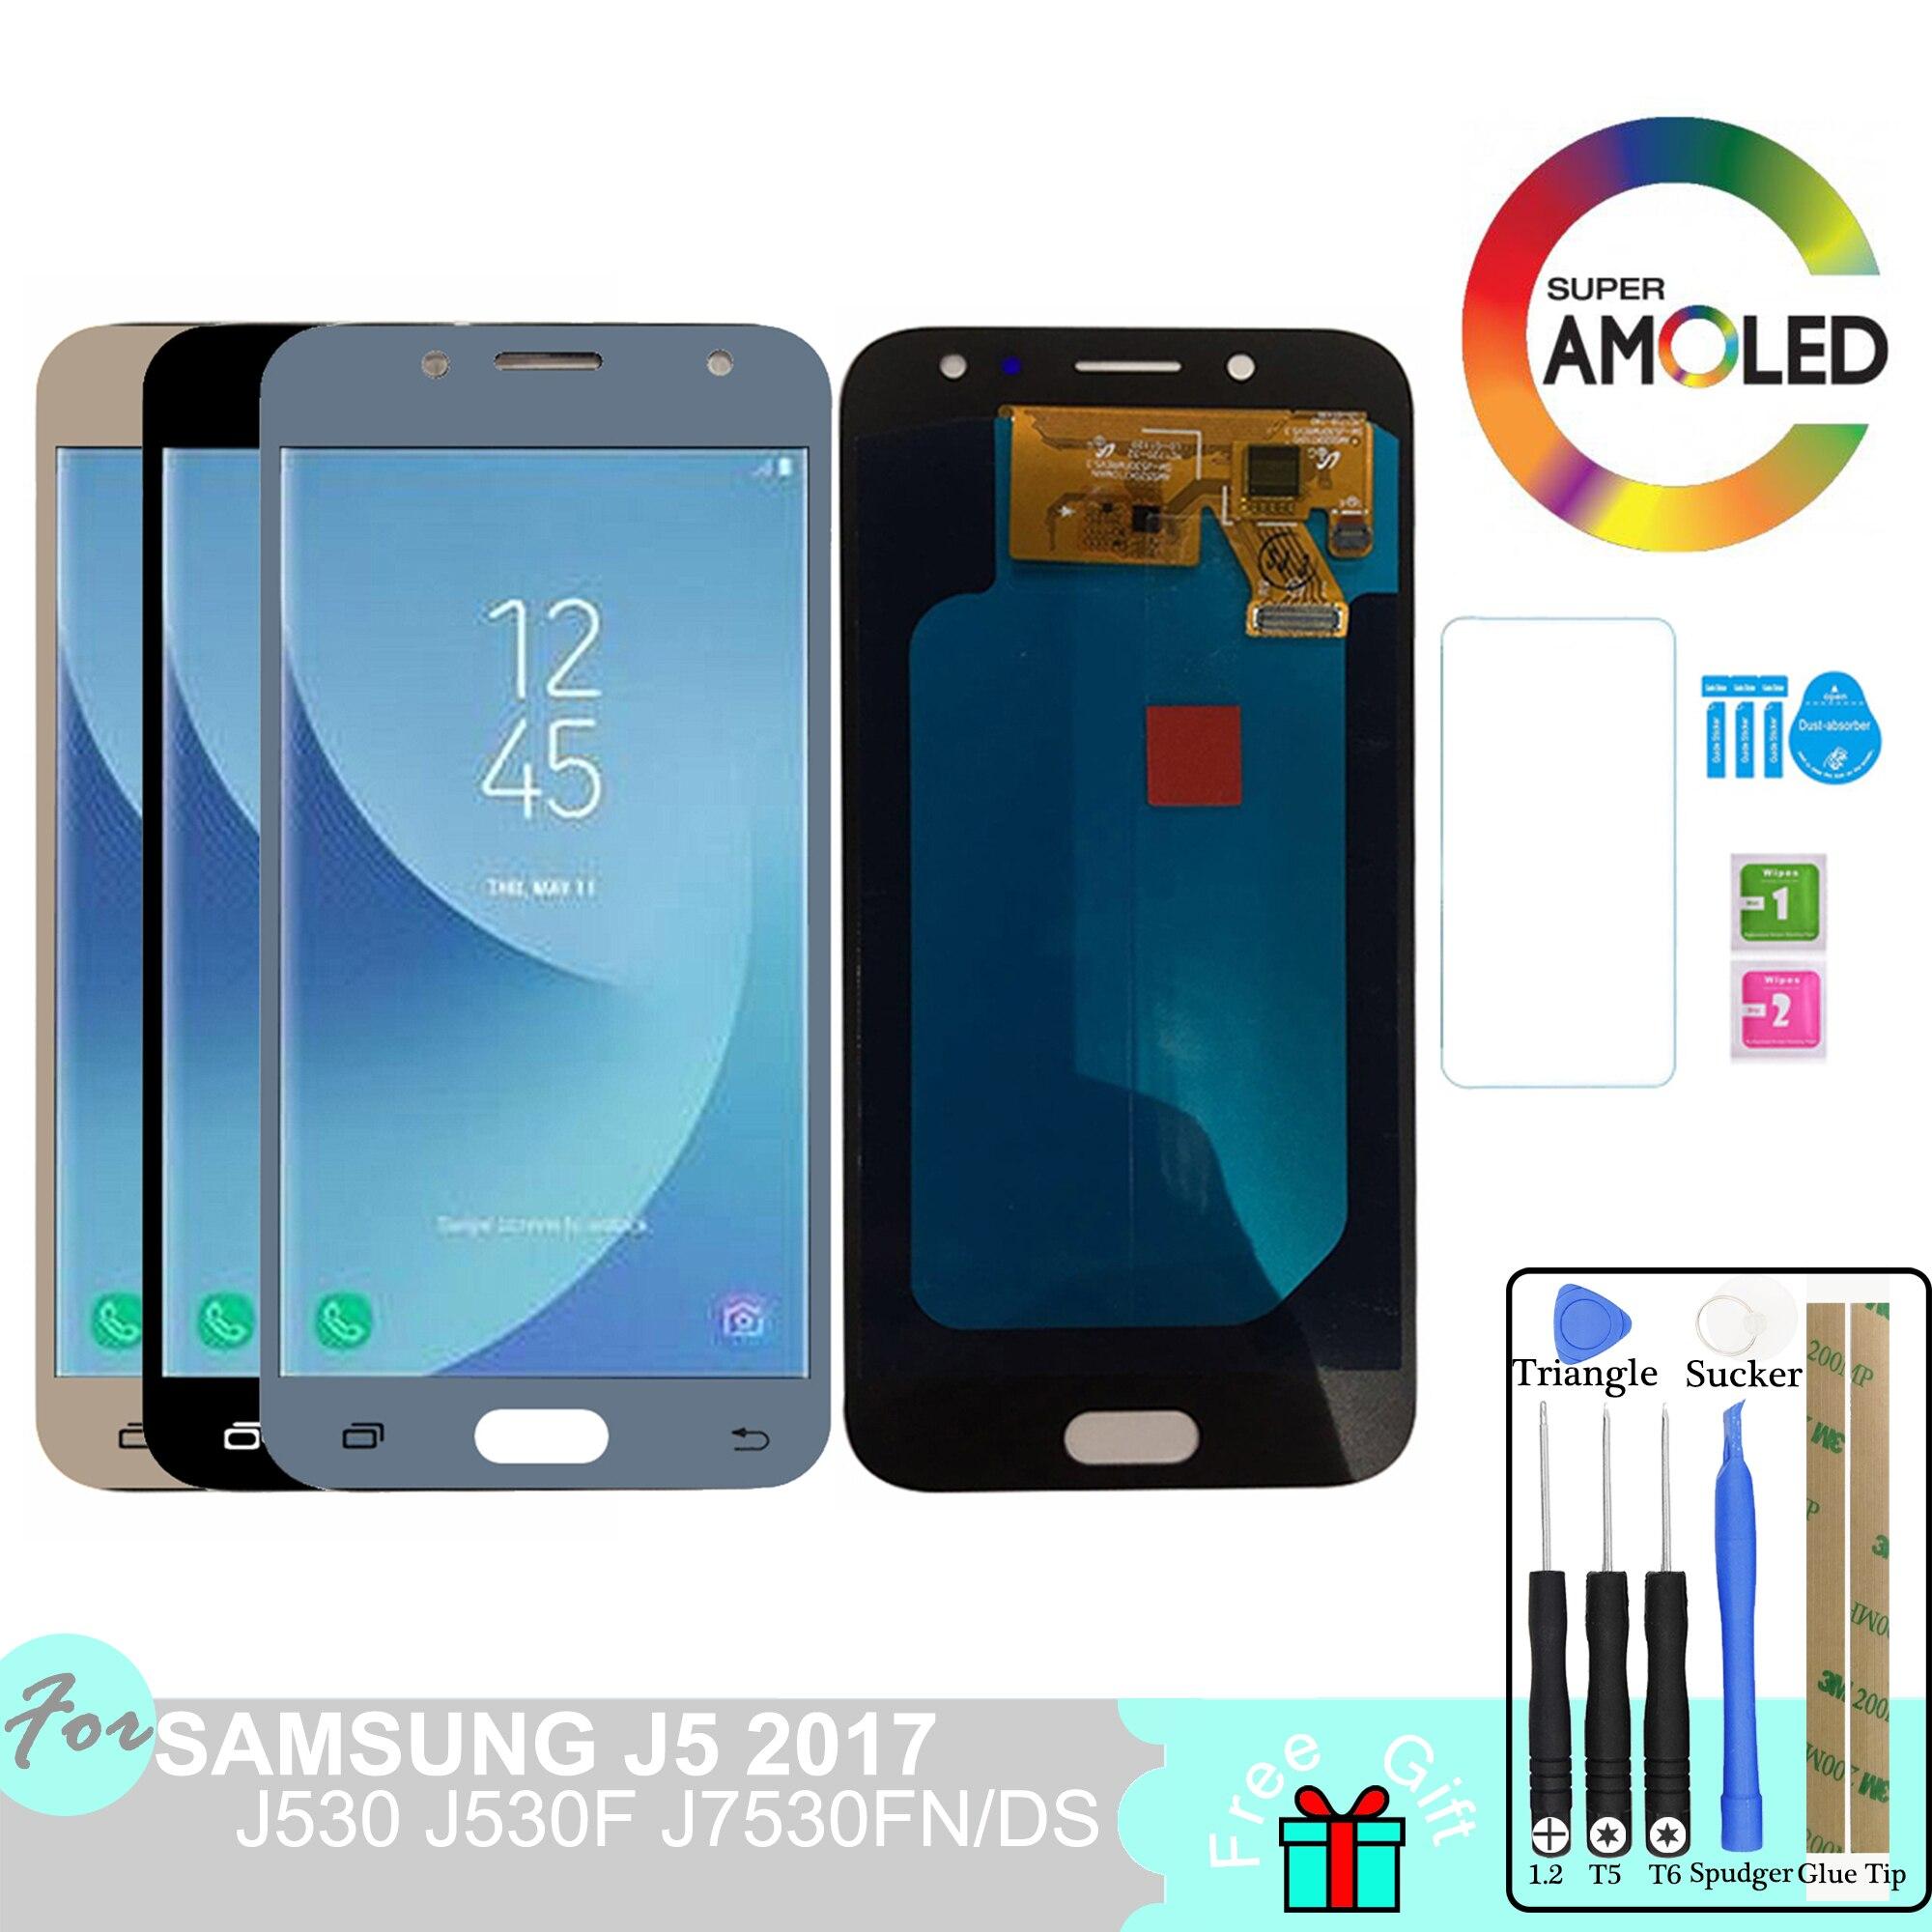 J530 LCD Super AMOLED pour Samsung Galaxy J5 Pro 2017 J530 J530F J530FN J530M écran tactile écran tactile Pancel SM-J530F/FN/M